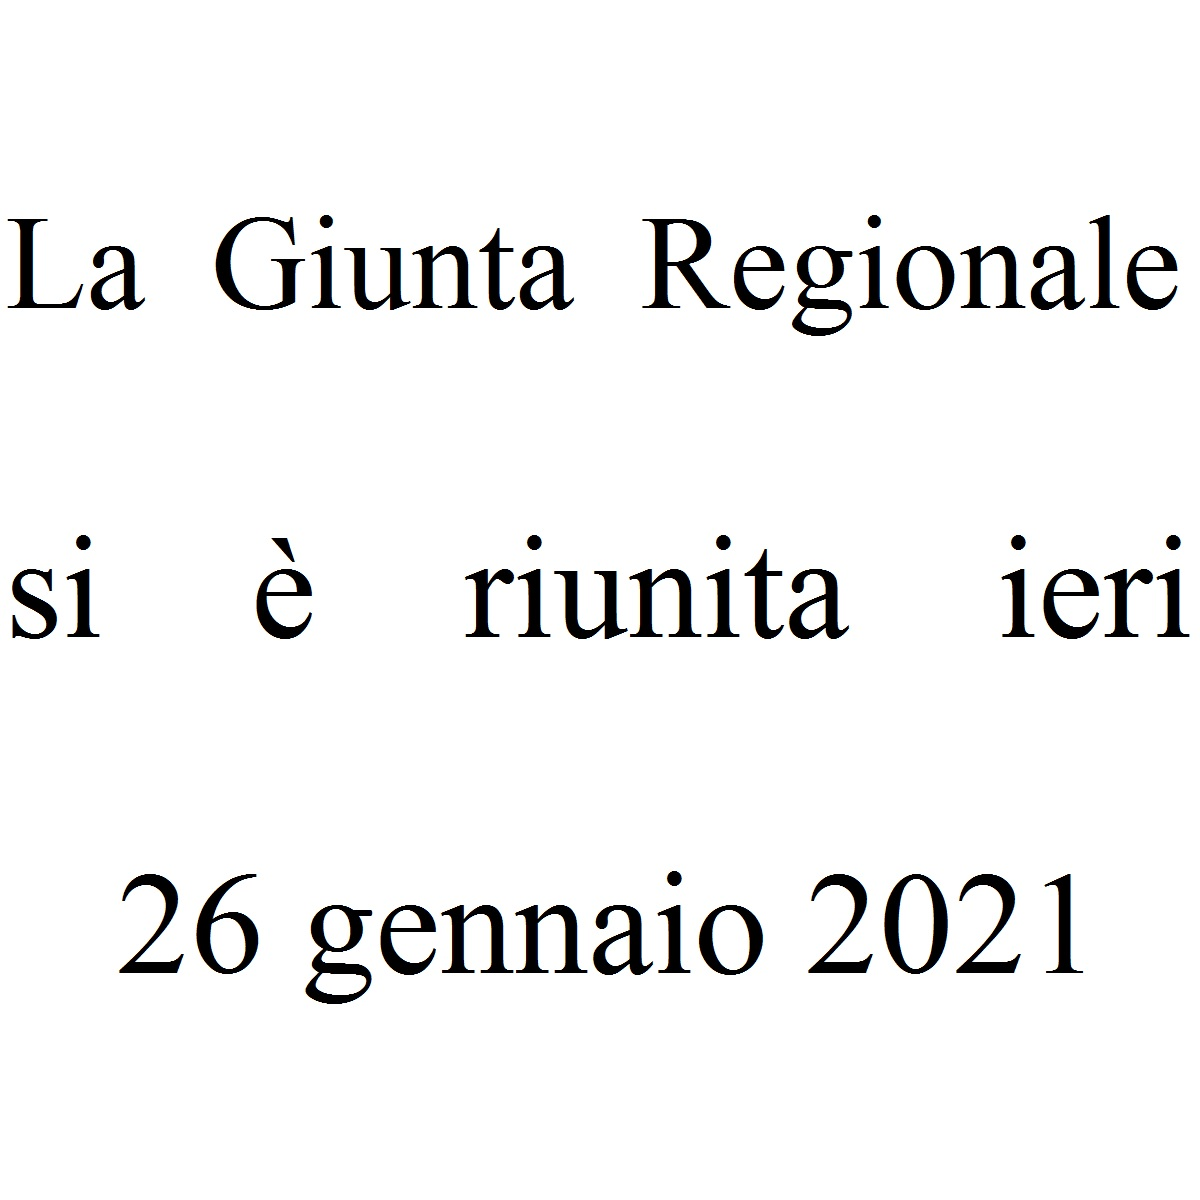 La Giunta Regionale si è riunita ieri 26 gennaio 2021 foto